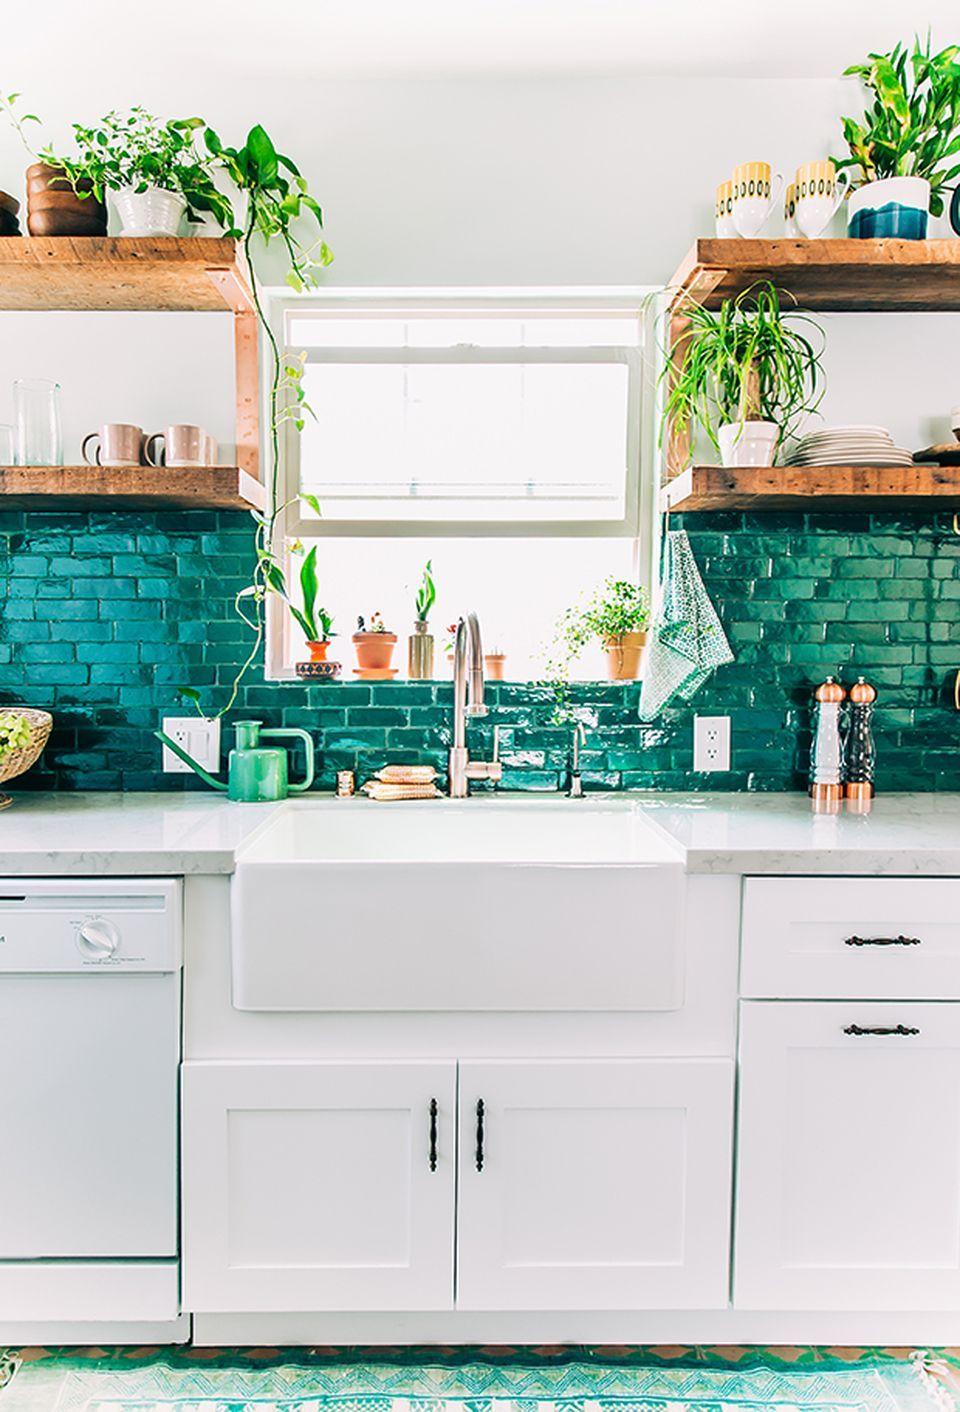 70 Ideas to Create Rustic Bohemian Kitchen Decorations | Kitchen ...